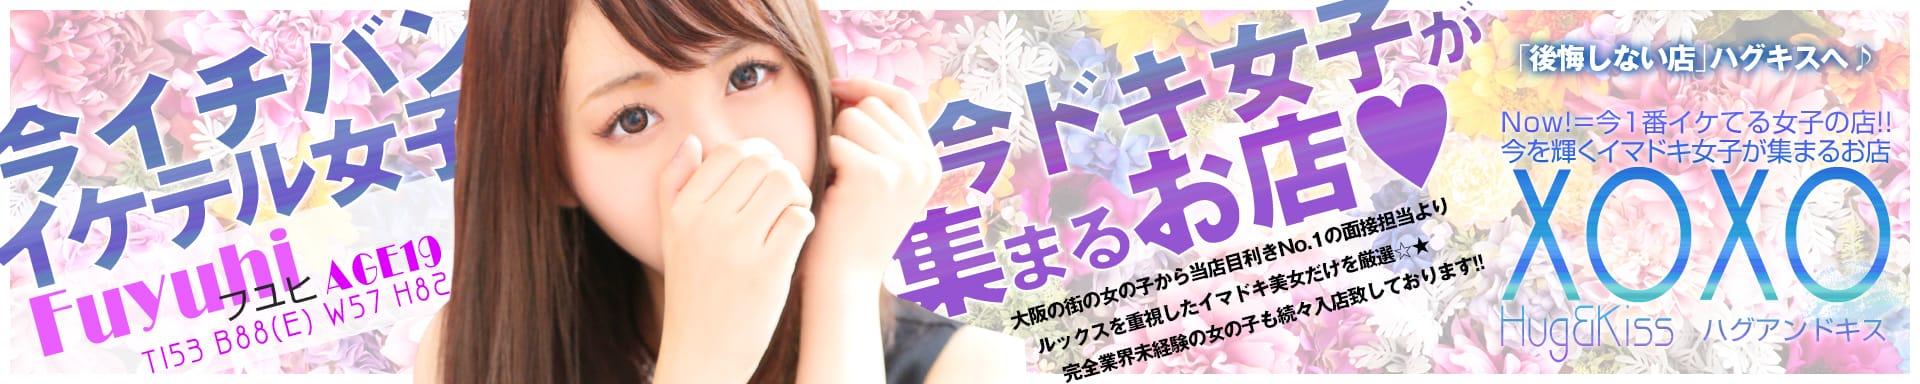 XOXO Hug&Kiss (ハグアンドキス) その2